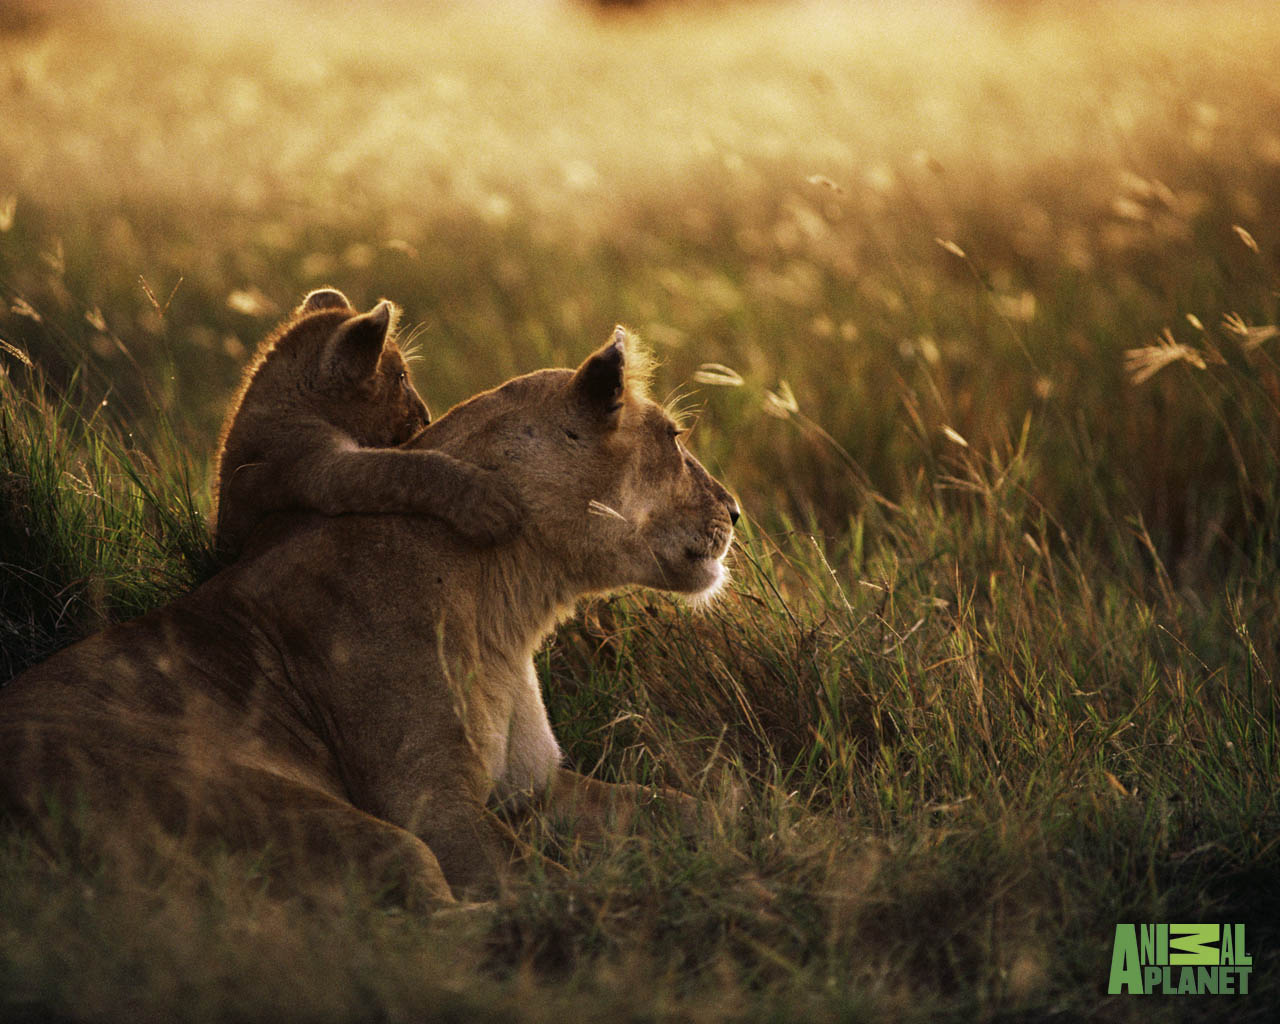 http://4.bp.blogspot.com/-3Qrr4fLmlNE/UFXf2Pc9n5I/AAAAAAAAEM8/ZgdLu-7buiI/s1600/lion-and-cub-1280.jpg